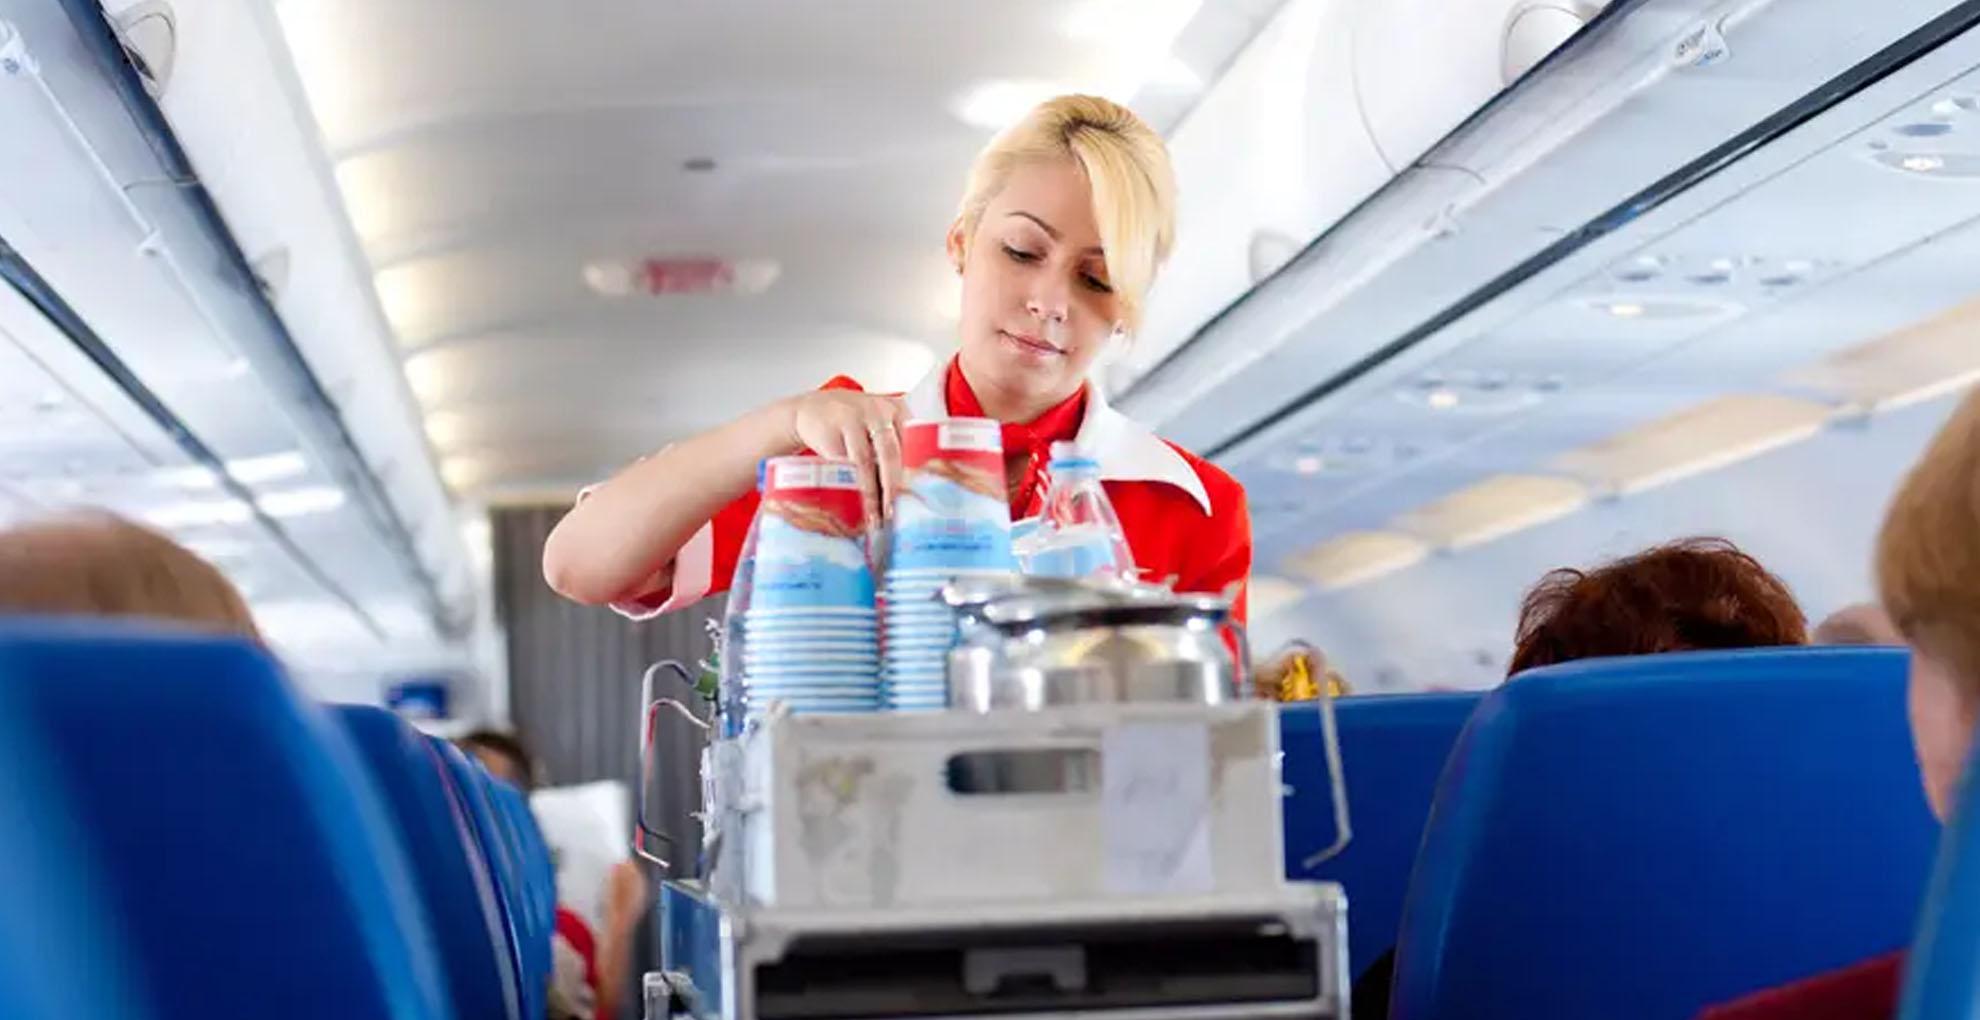 Proper diet to take before boarding a flight